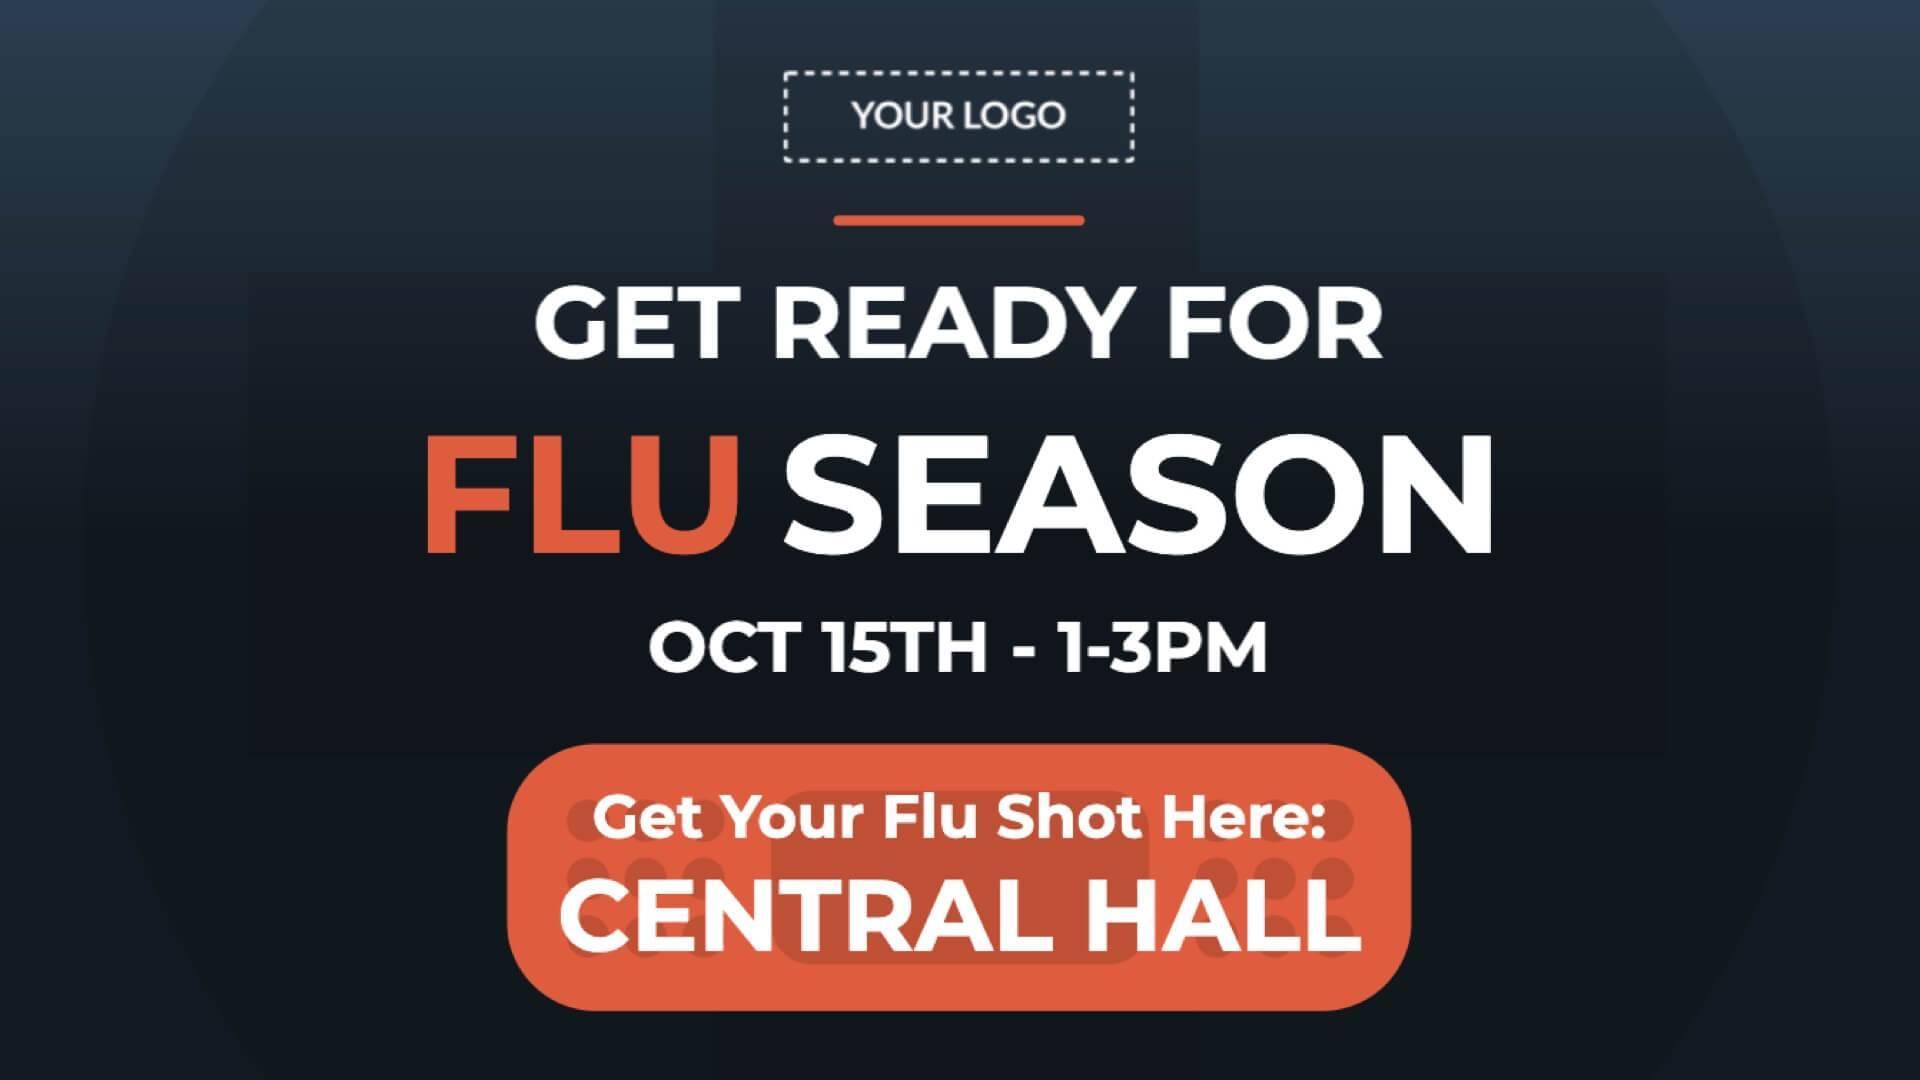 Flu Vaccination Location Digital Signage Template